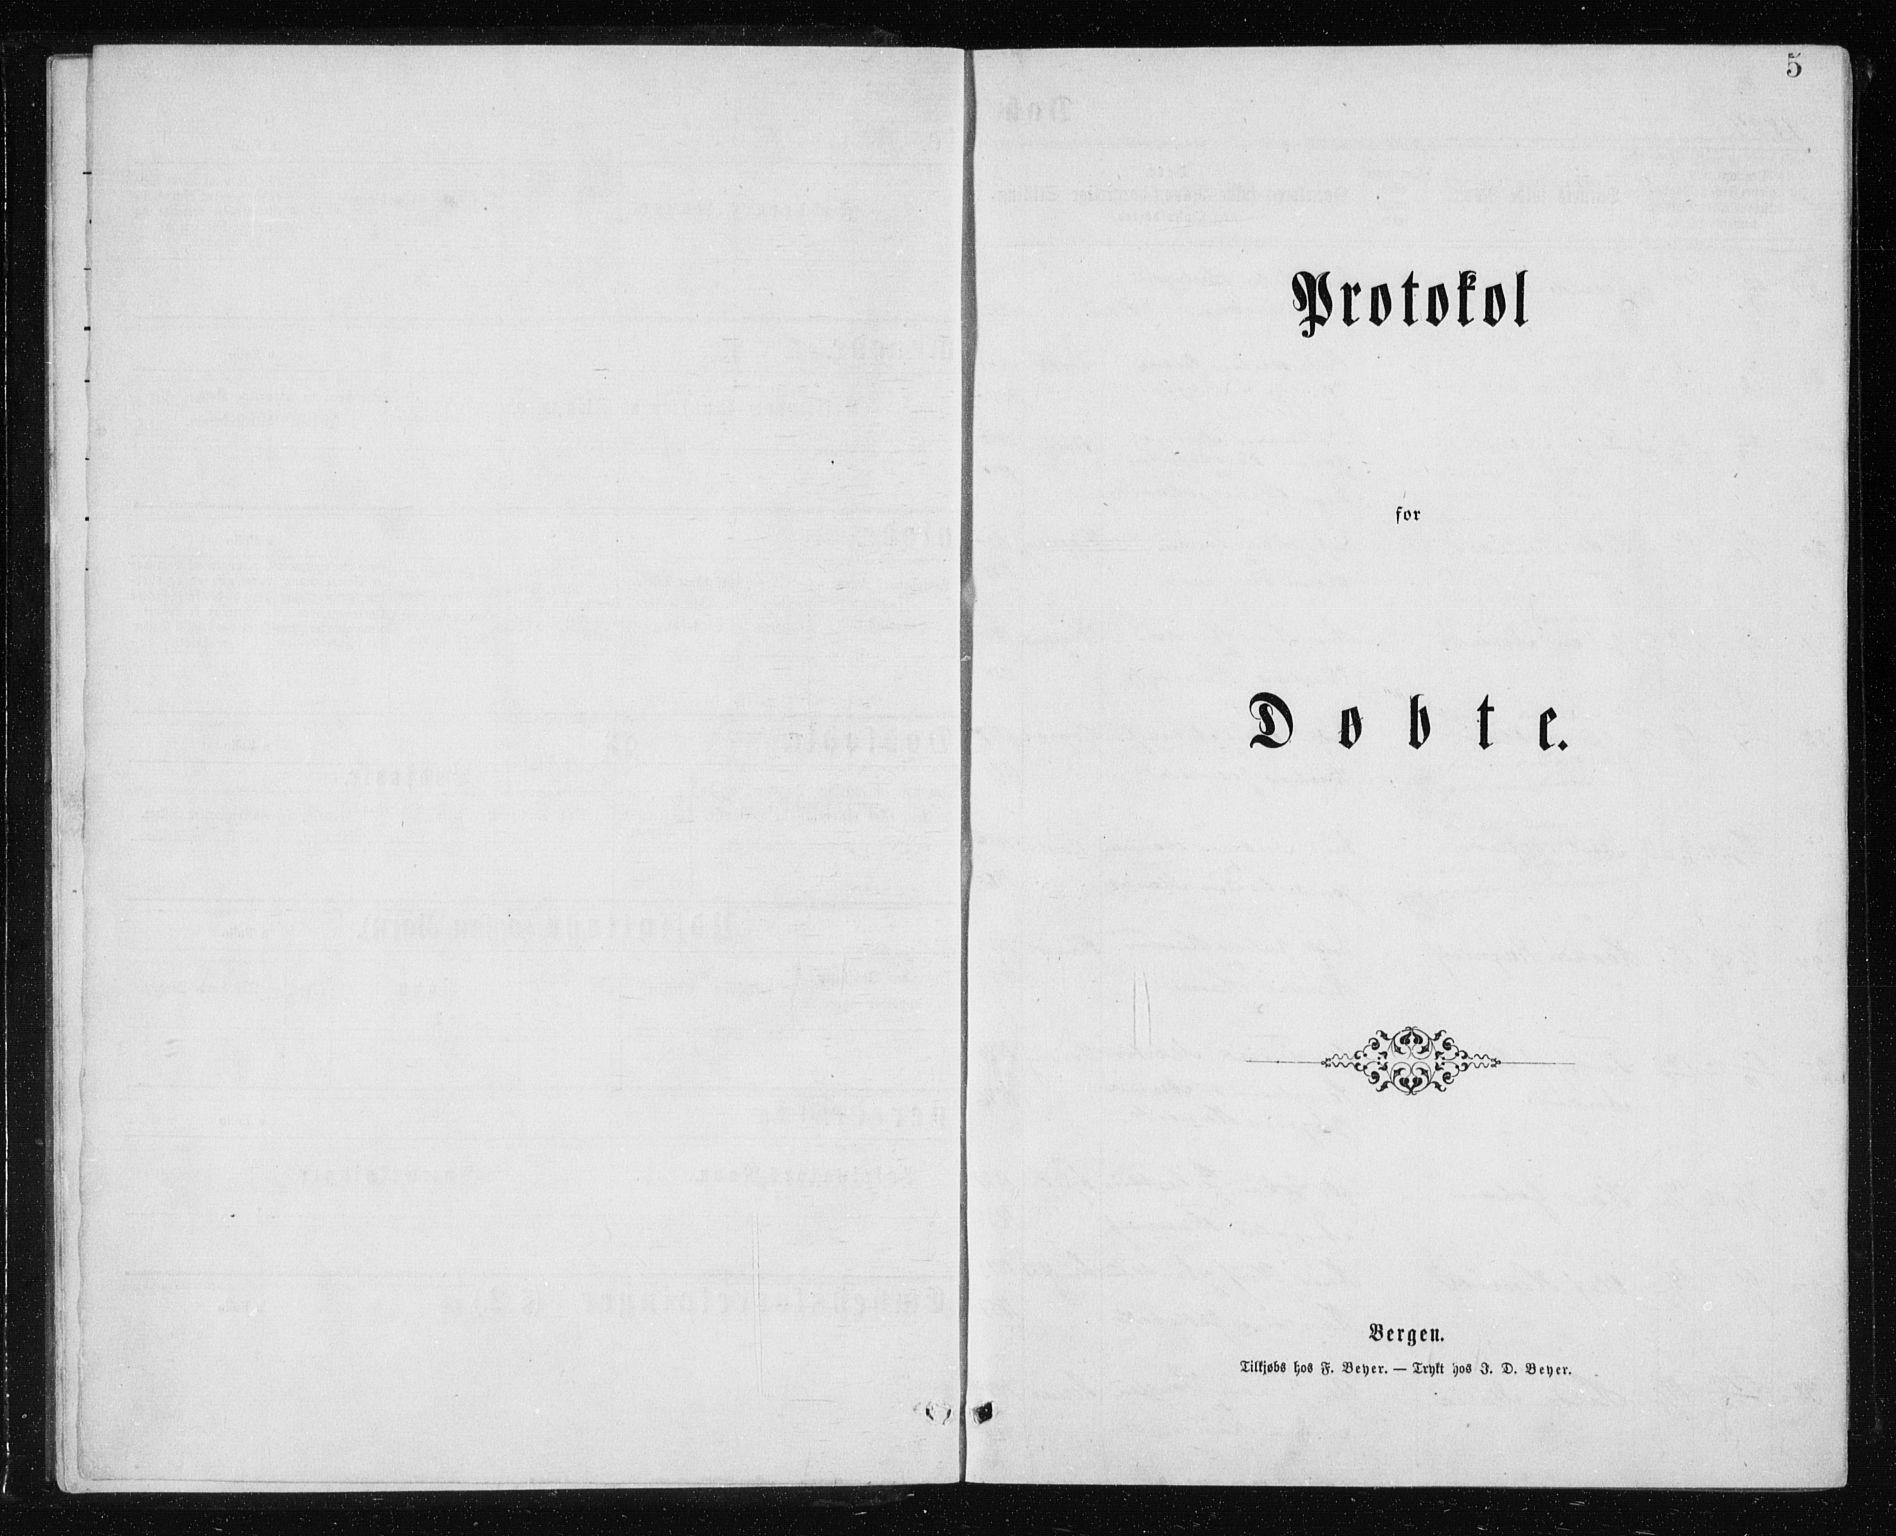 SAT, Ministerialprotokoller, klokkerbøker og fødselsregistre - Nordland, 801/L0031: Klokkerbok nr. 801C06, 1883-1887, s. 5